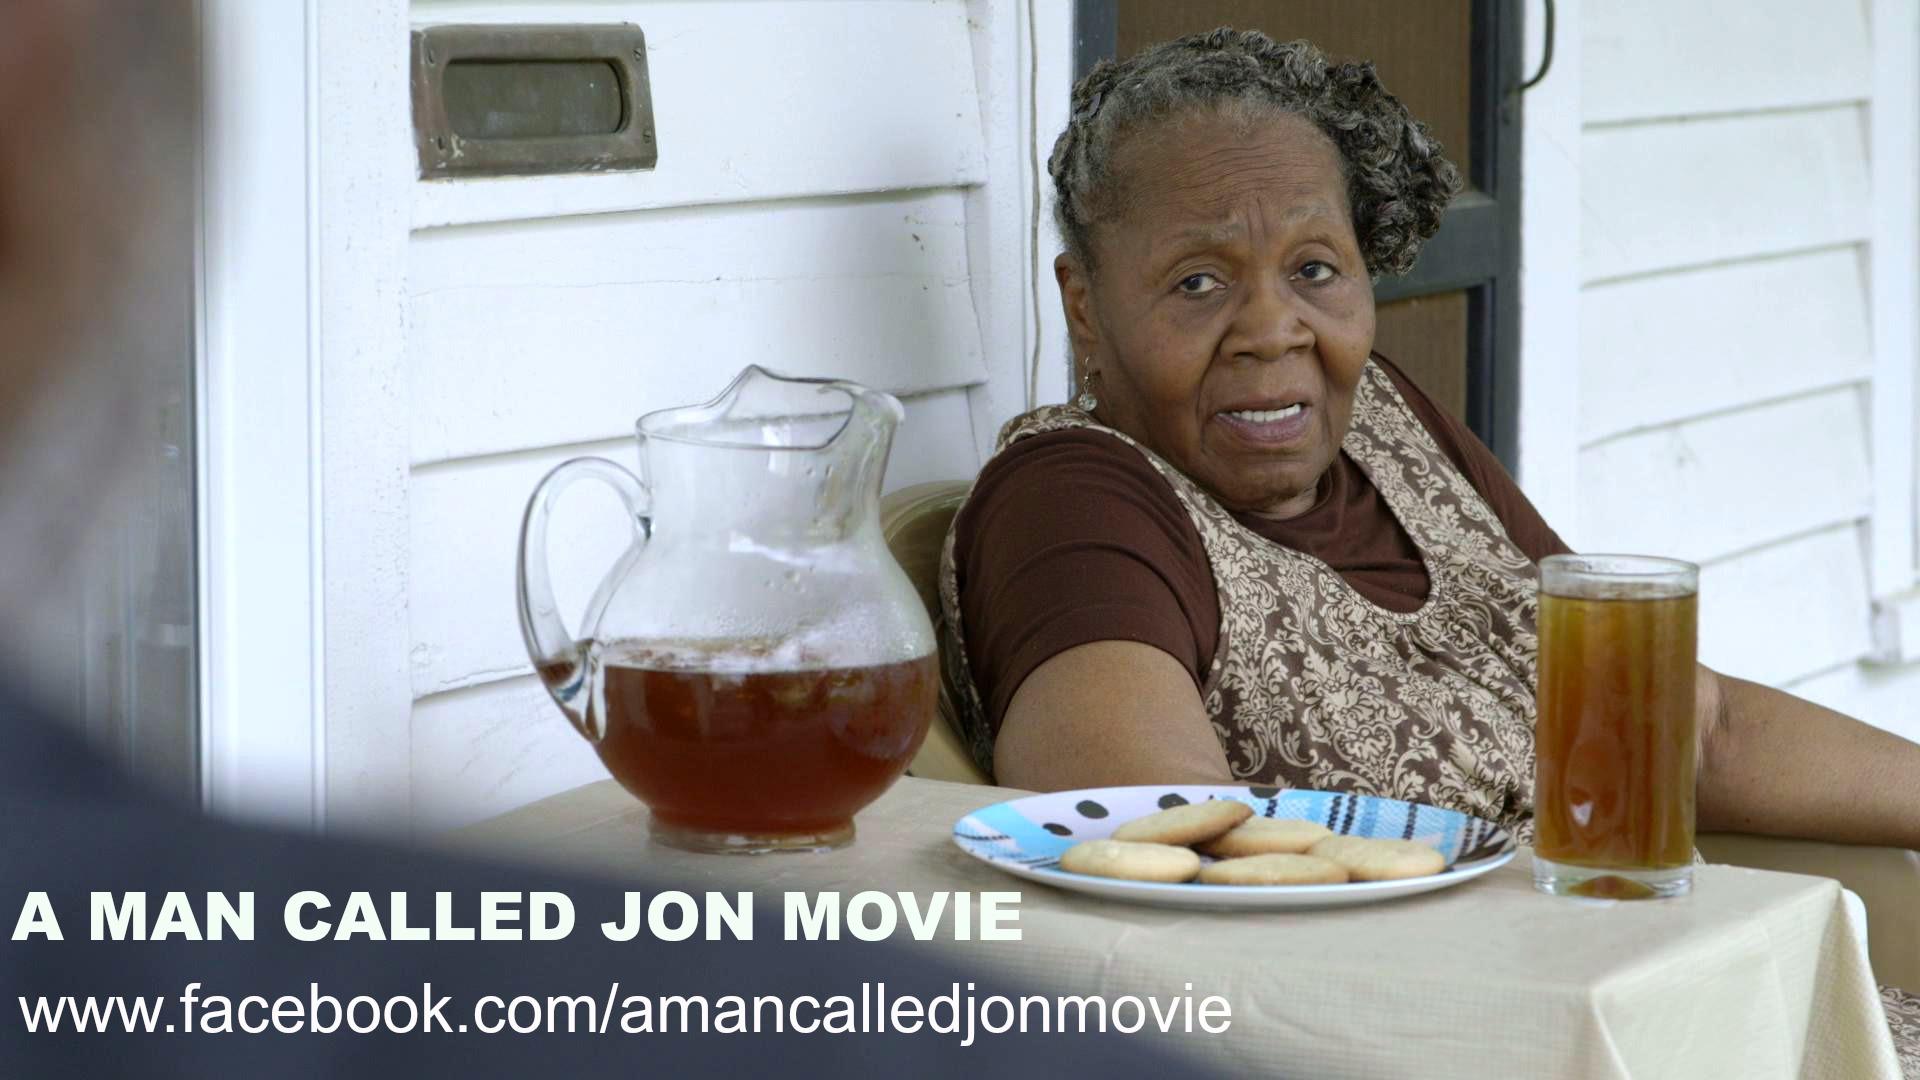 Irma P. Hall Promo in AMCJ